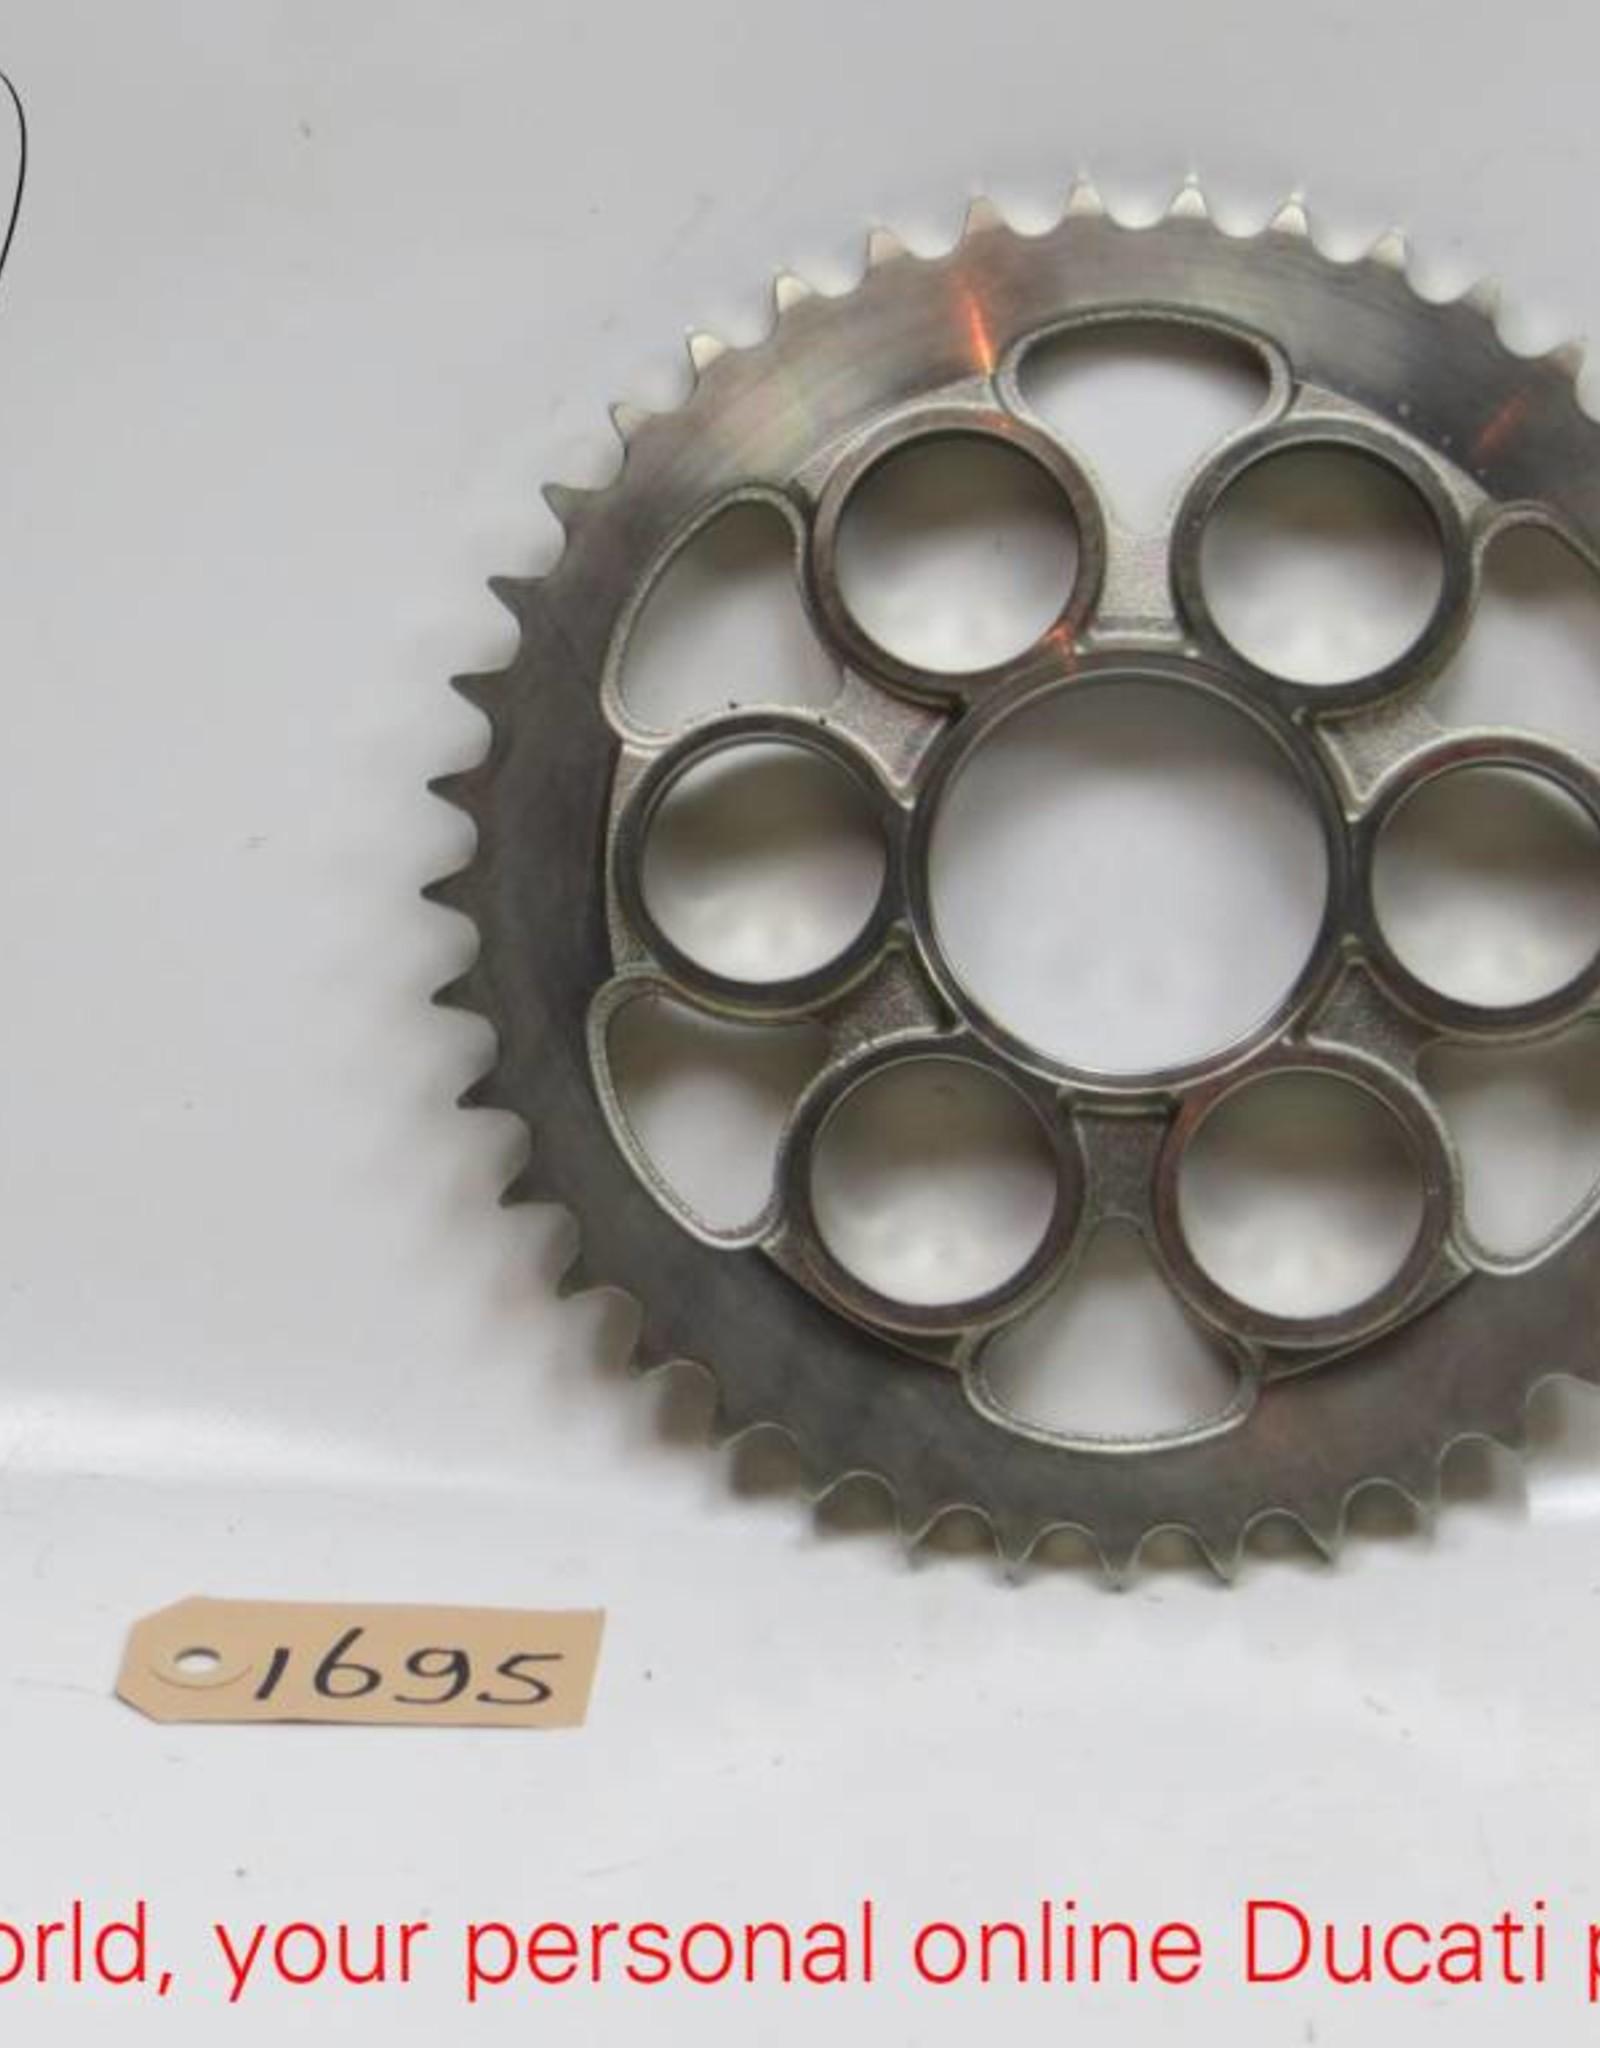 Ducati Ducati Rear Sprocket T=41 Monster 1200